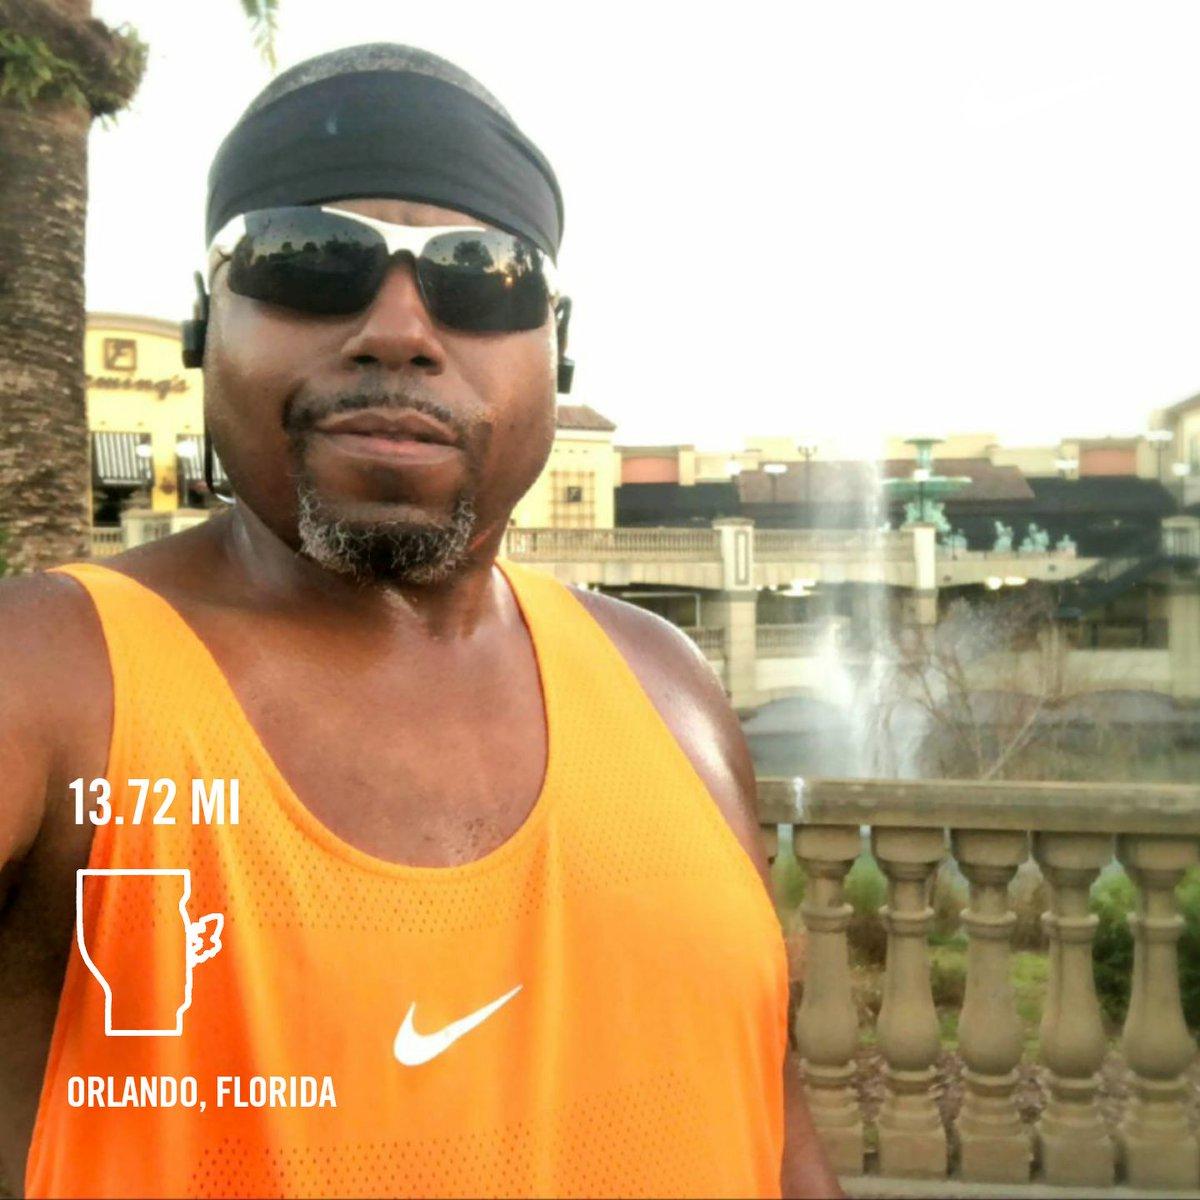 Ran 13.72mi with Nike Run Club #builtbyGOD #poweredbyJESUS #iserveaGreatGOD #TeamOJB #Autism #AutismDad #USArmy #USArmyRetired #blkmenrun #blkrunners #runforlife #nikeplus #TeamRWB #runningdad #nikerunclub #nikerunning #runplanet #run2020 #runnershigh #runtoinspire #runorlandopic.twitter.com/BY6R2g5w5B